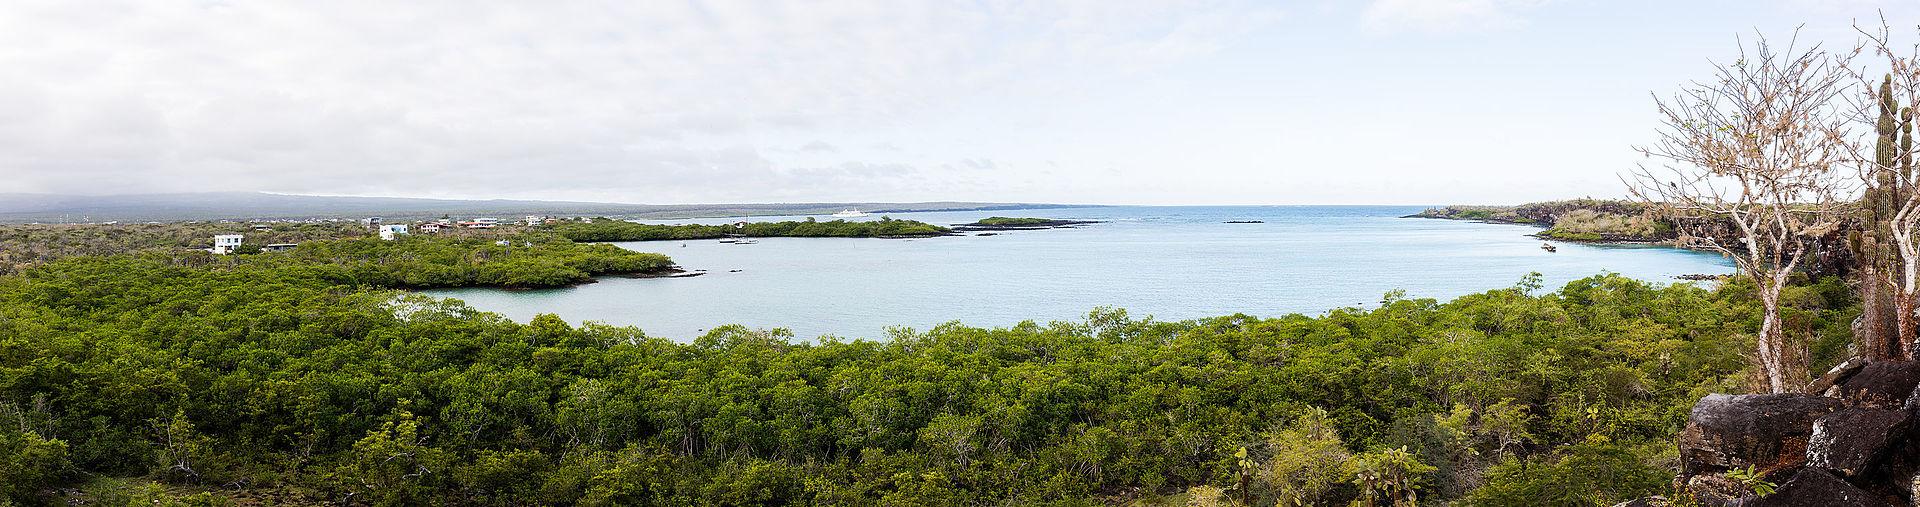 Isla Santa Cruz, Galápagos (Foto: Diego Delso)